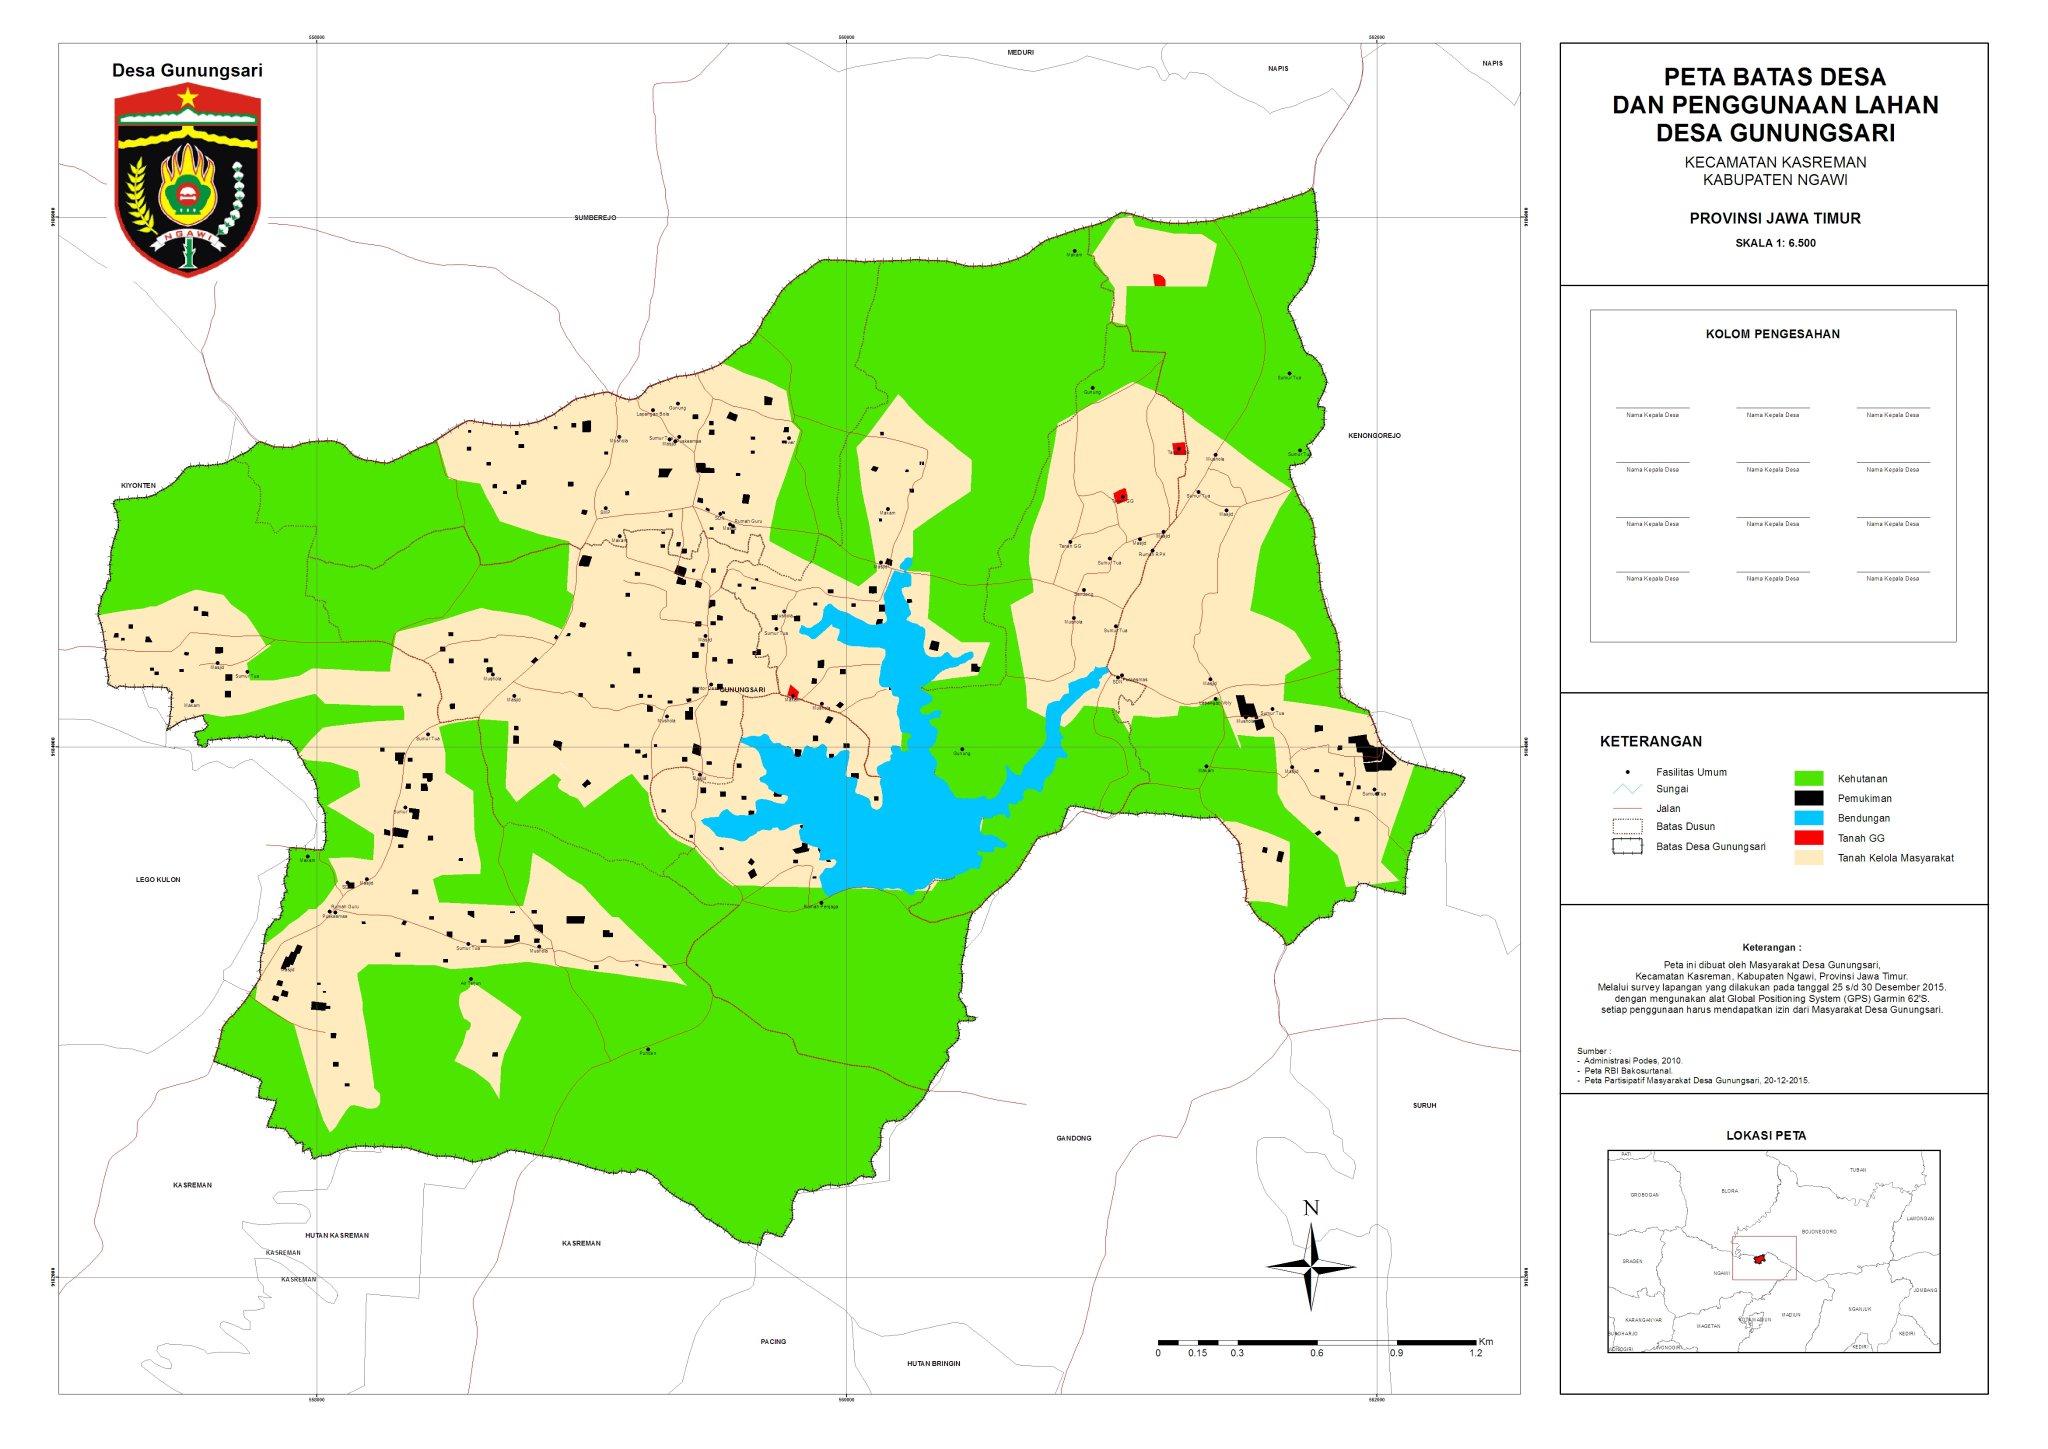 "gunungsari on Twitter: ""Peta Batas Desa dan Penggunaan ..."